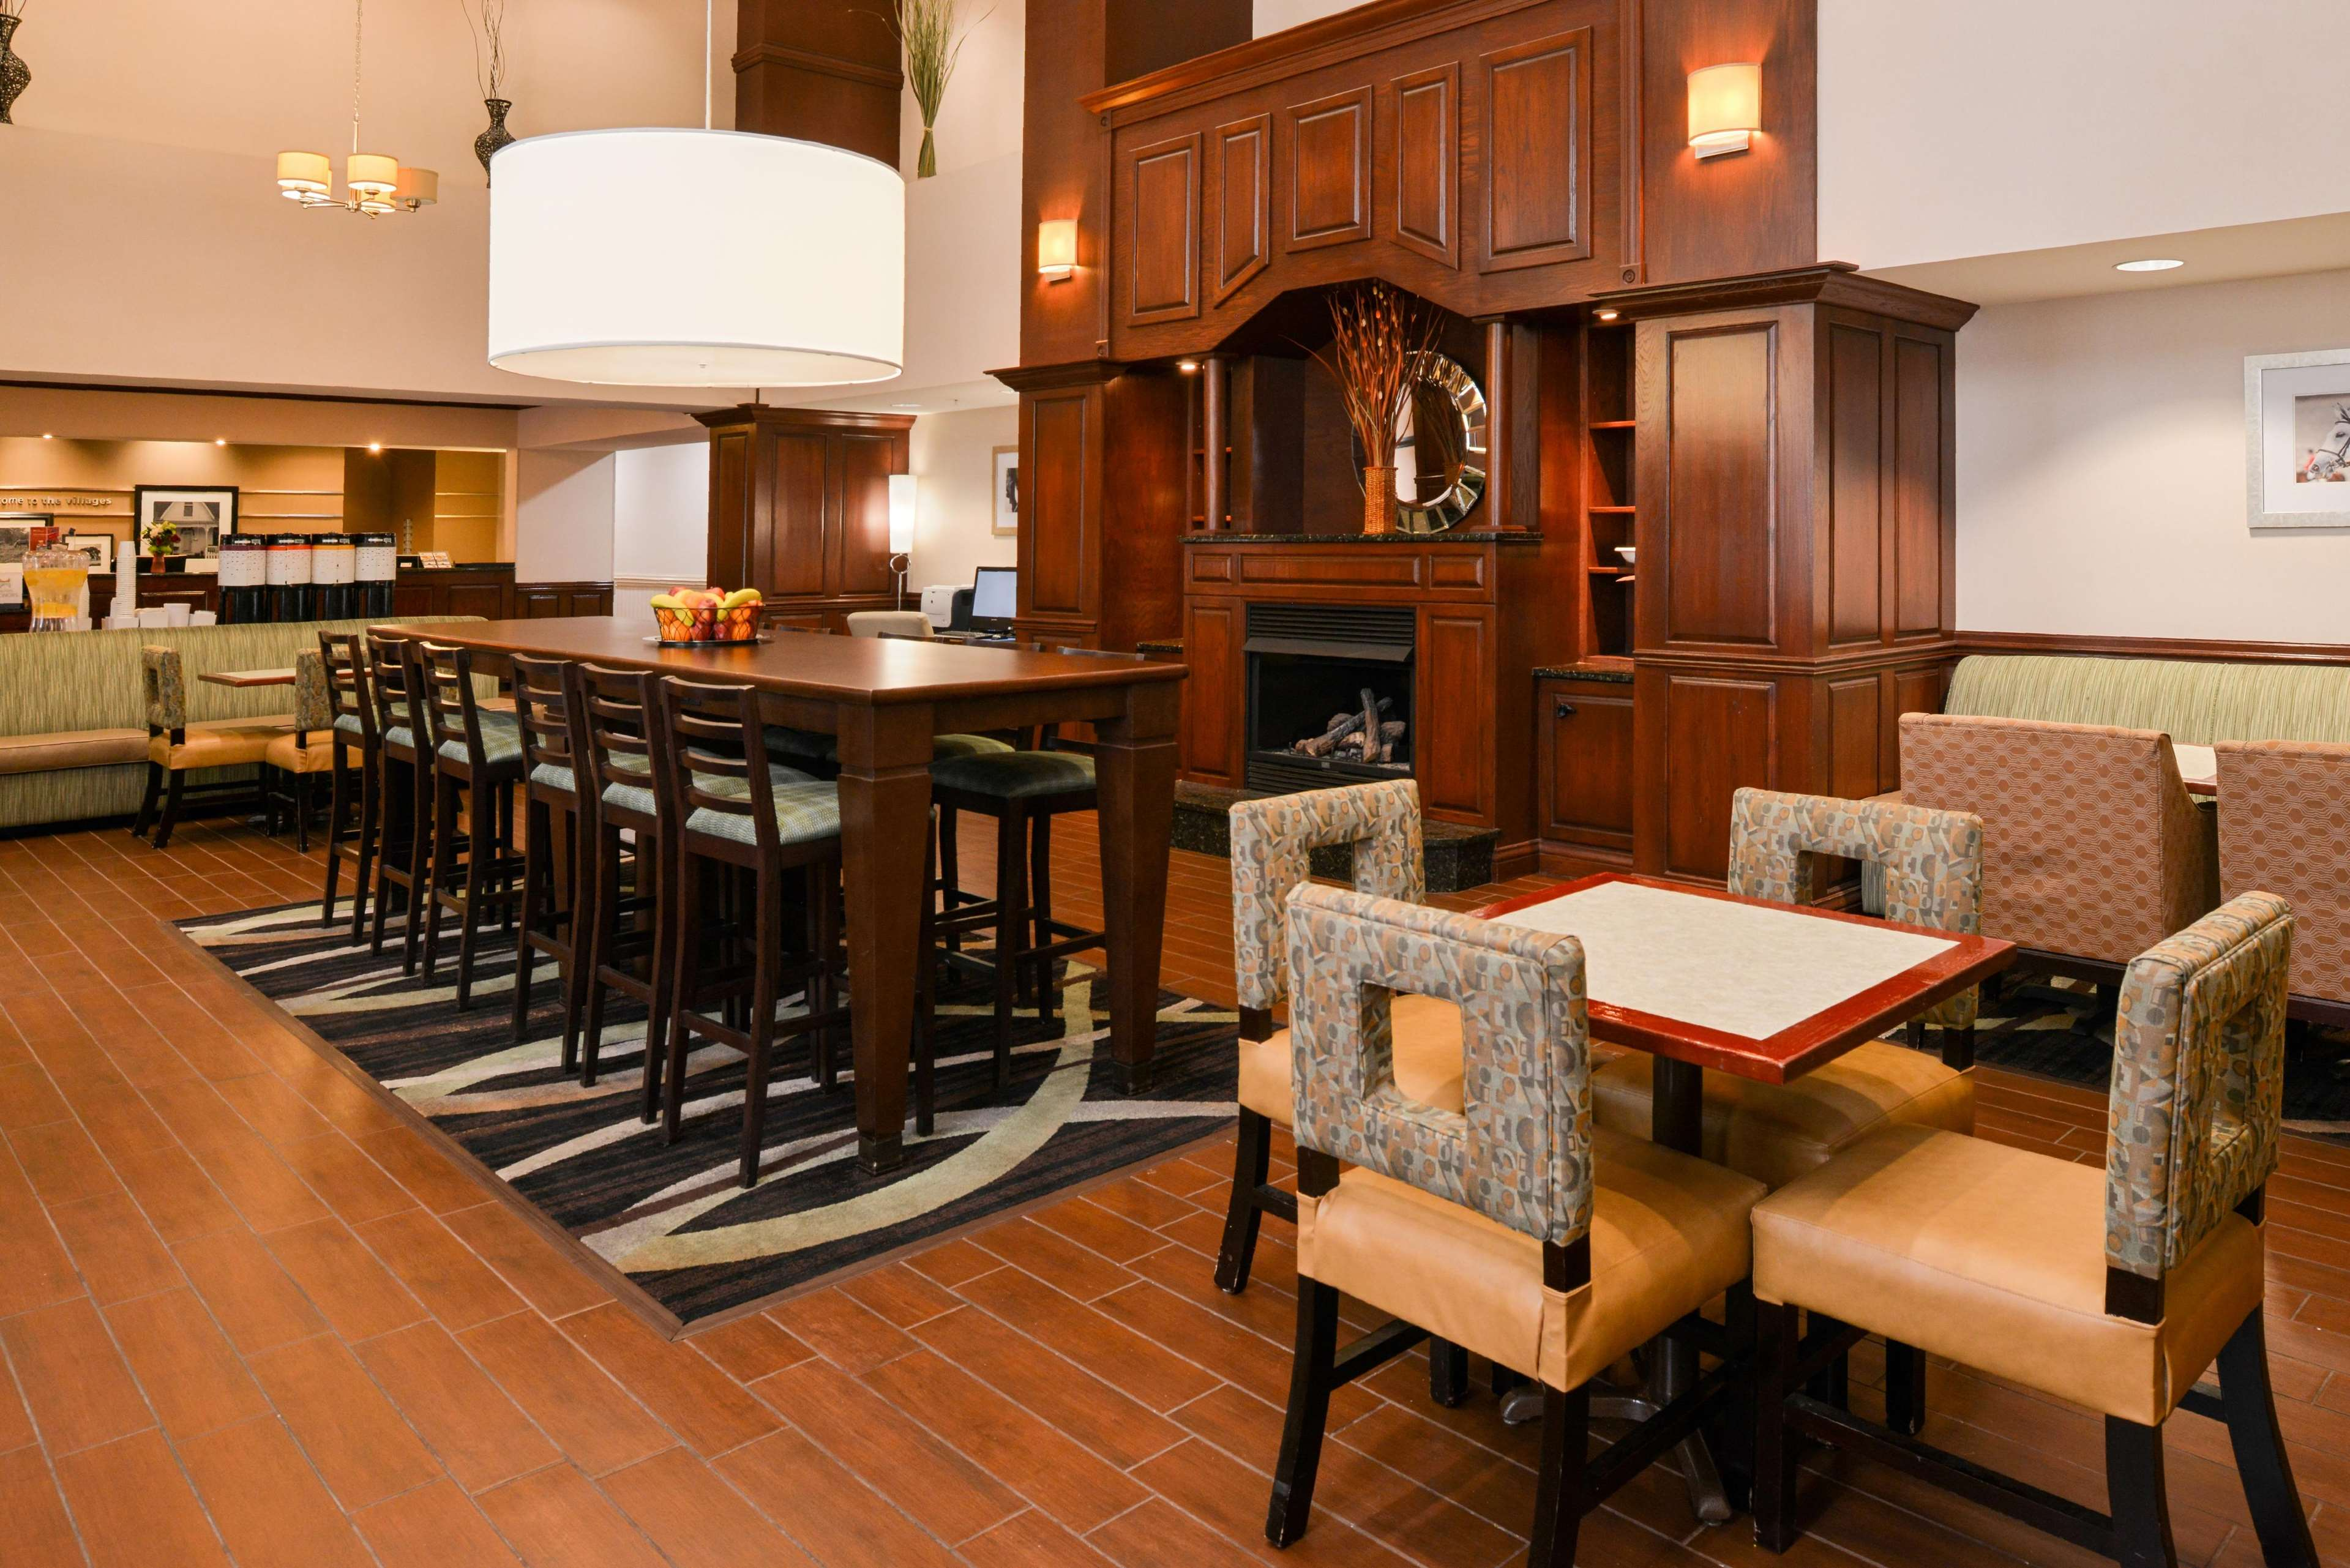 Hampton Inn & Suites Lady Lake/The Villages image 8